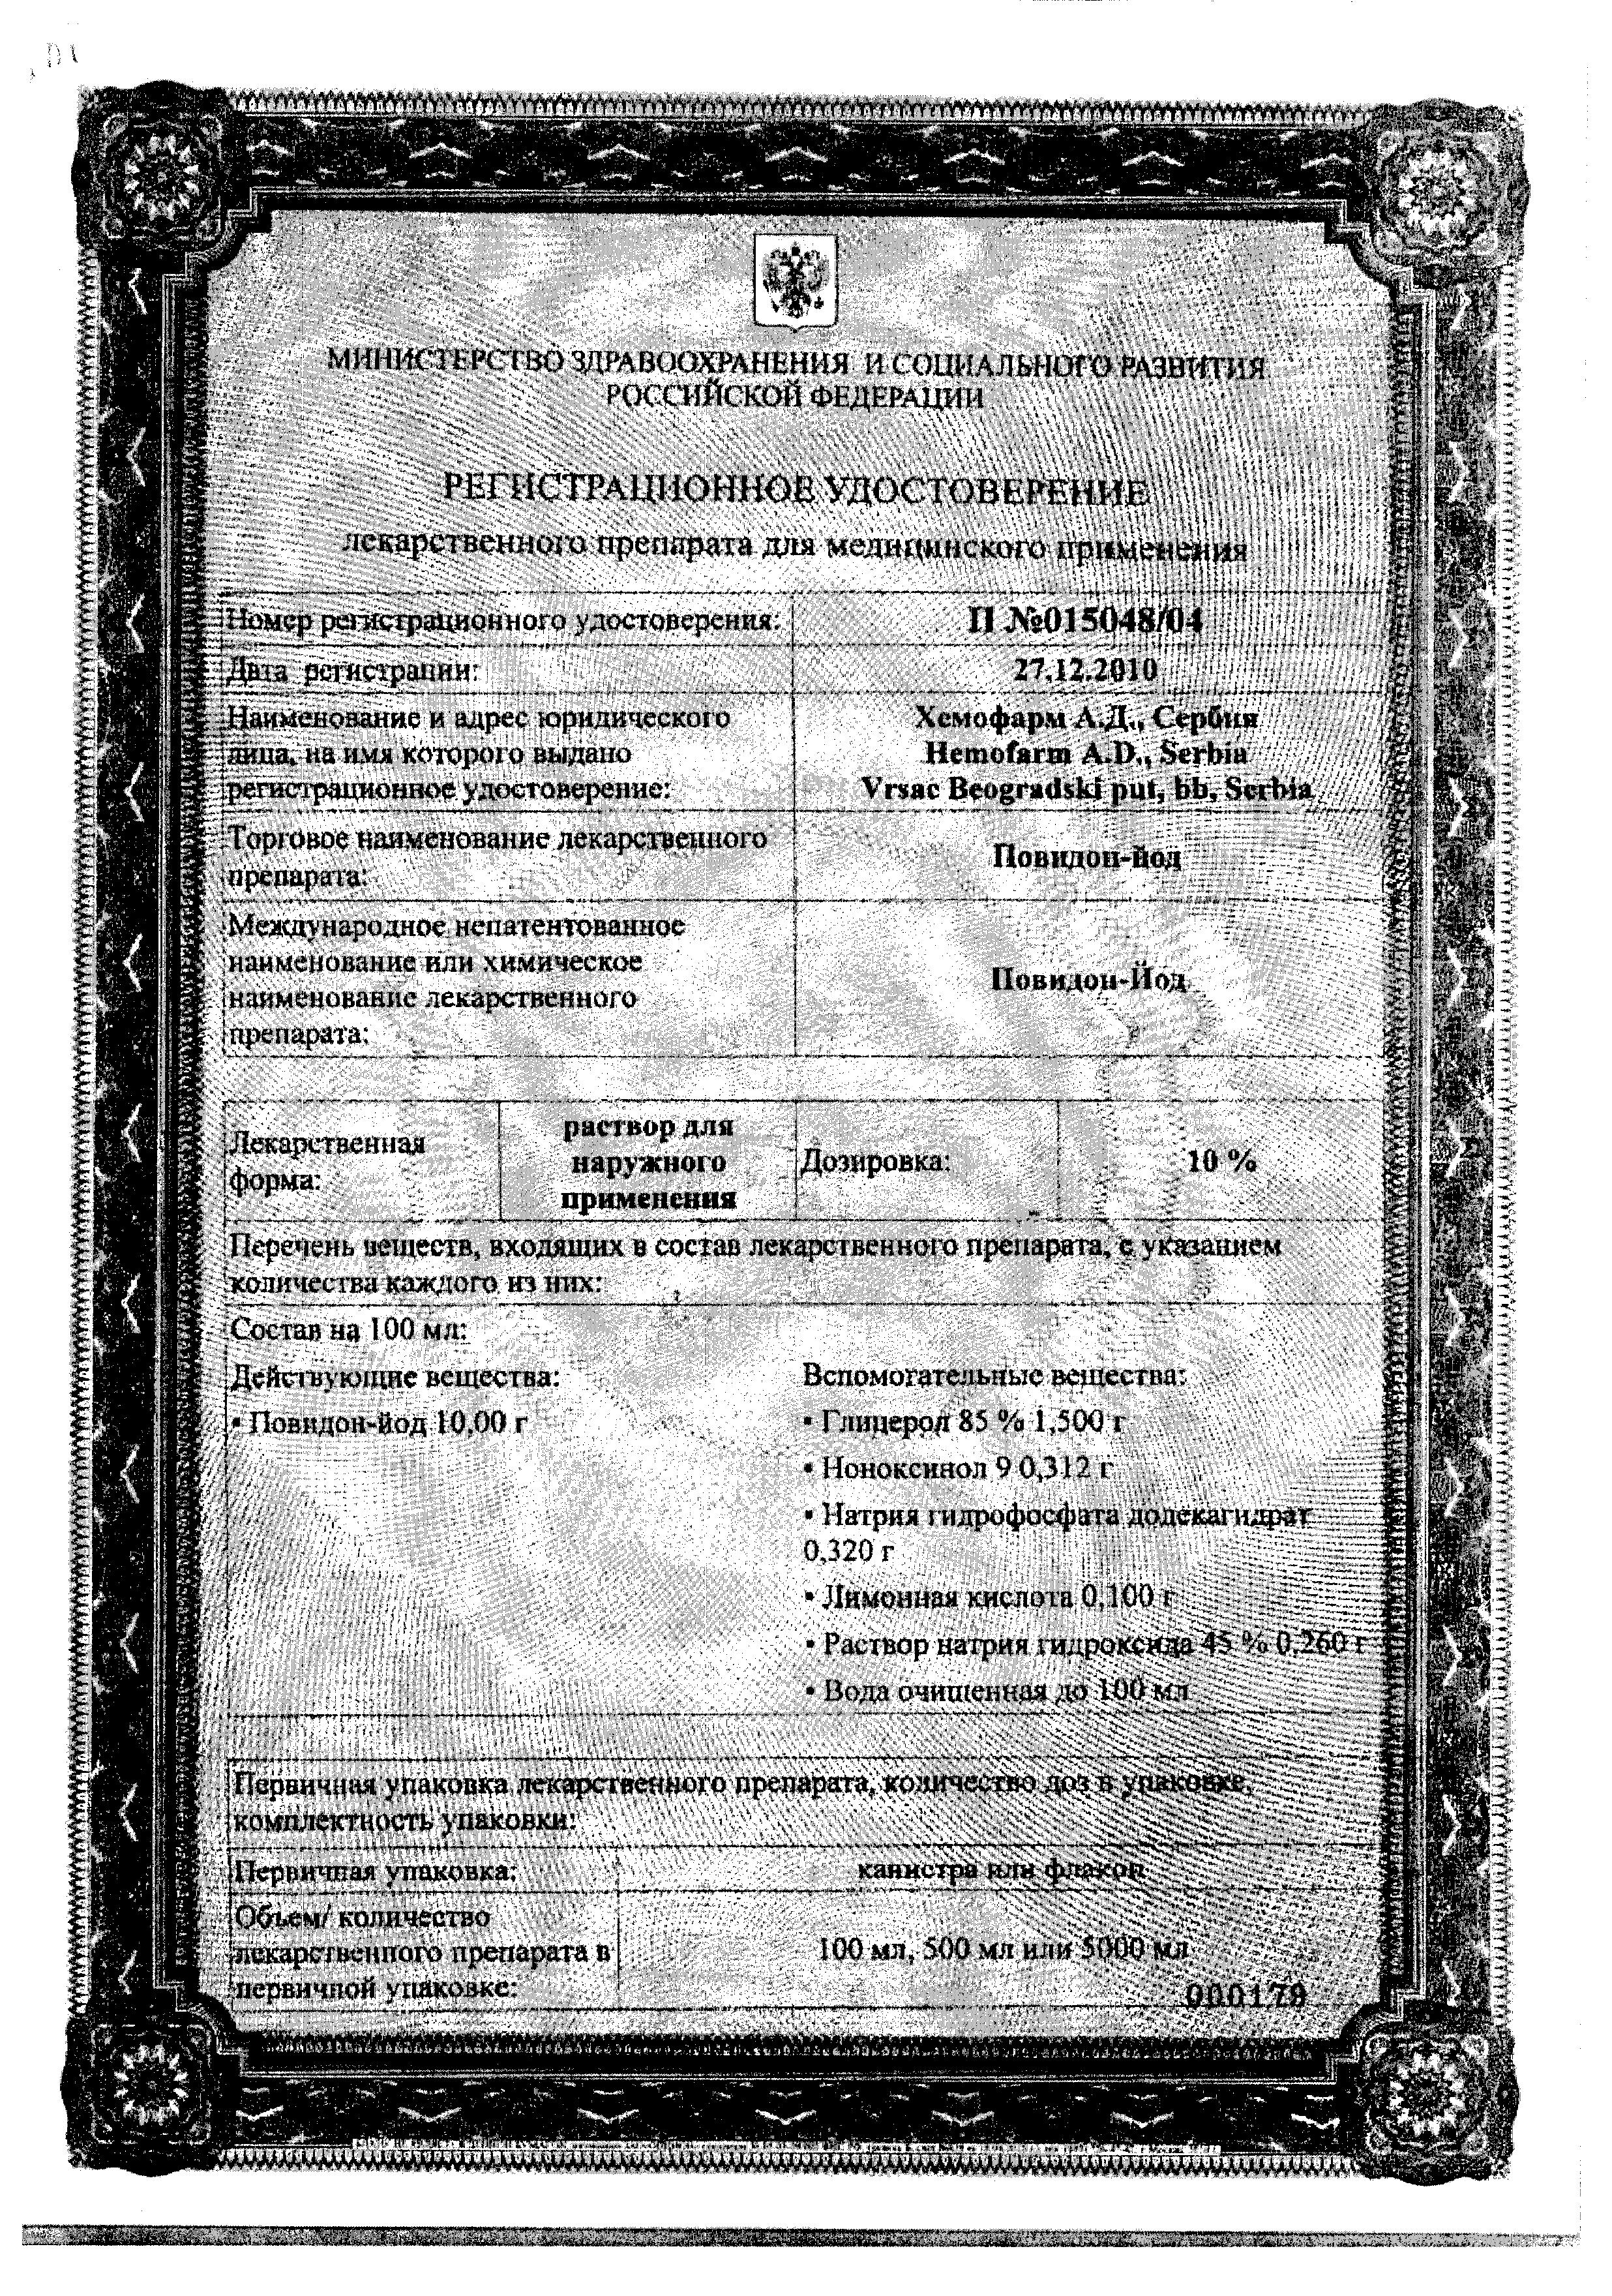 Повидон-йод сертификат